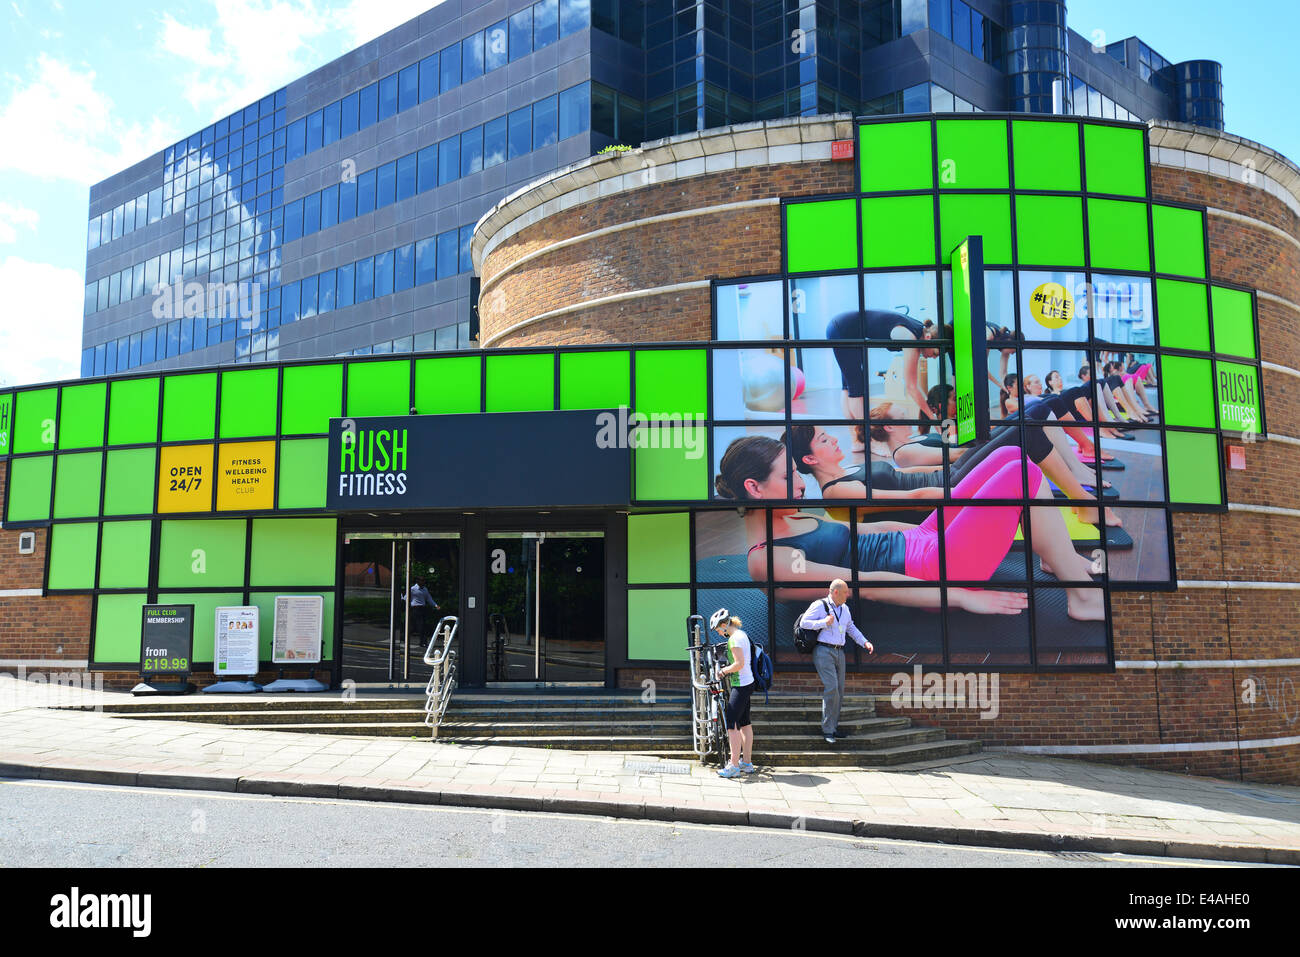 Rush Fitness Health Club, High Street, Uxbridge, London Borough of Hillingdon, Greater London, England, United Kingdom - Stock Image